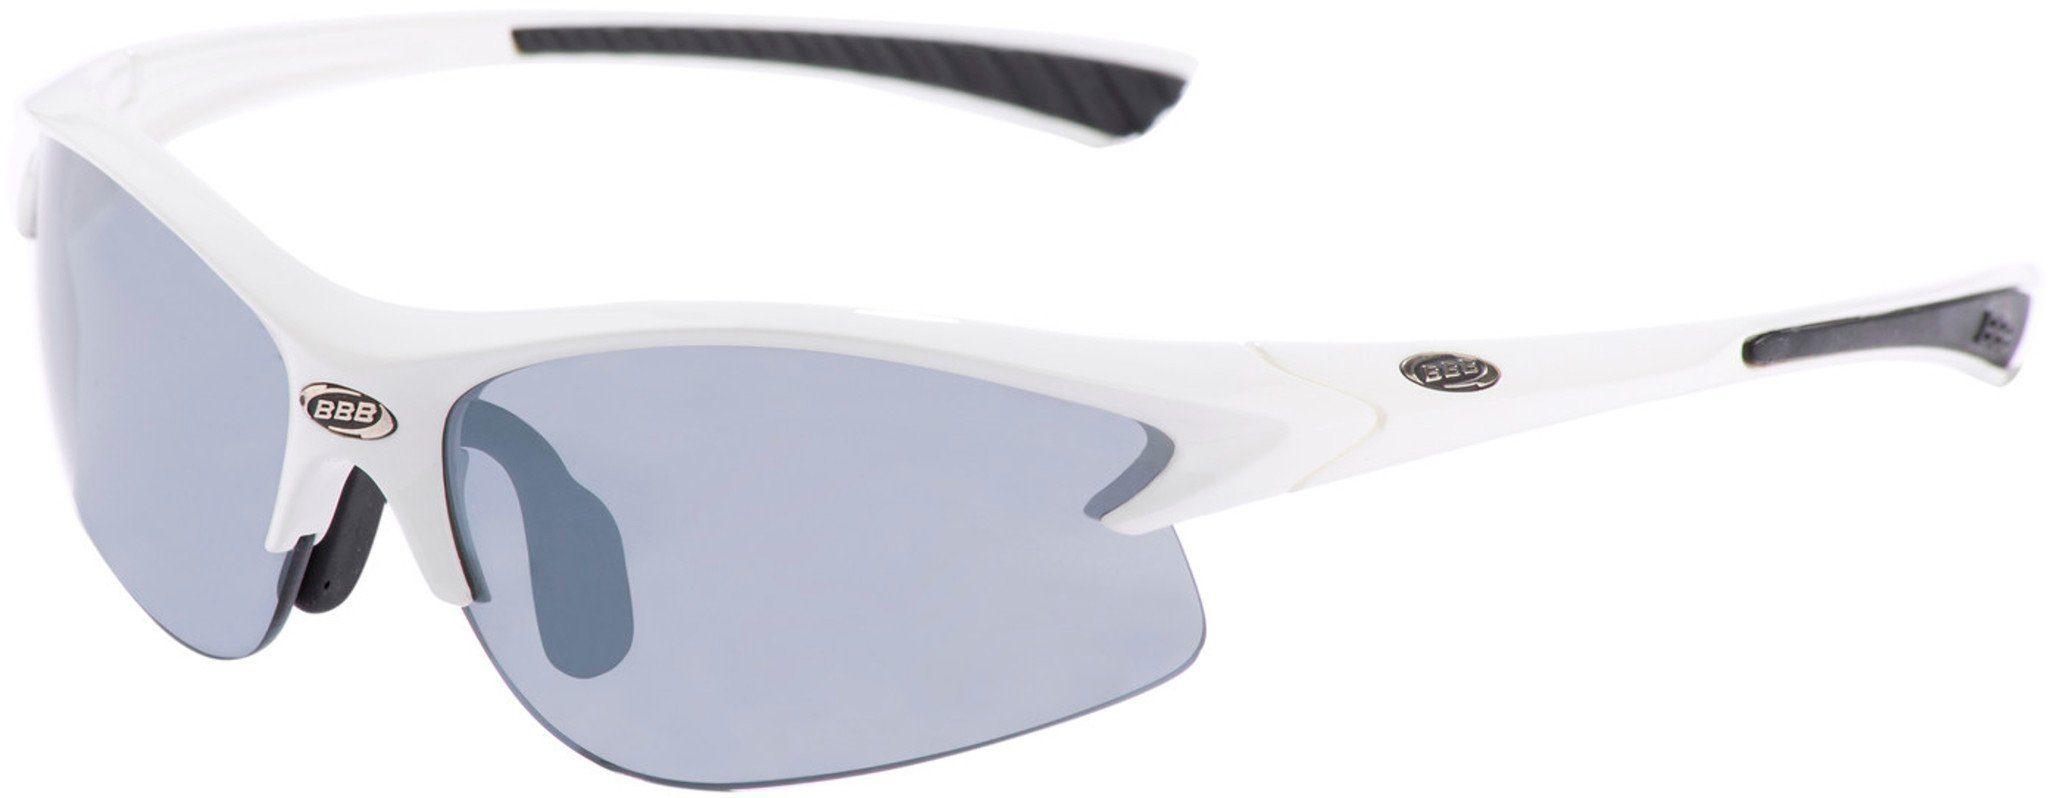 BBB Sportbrille »Impulse BSG-38 Sonnenbrille Small«